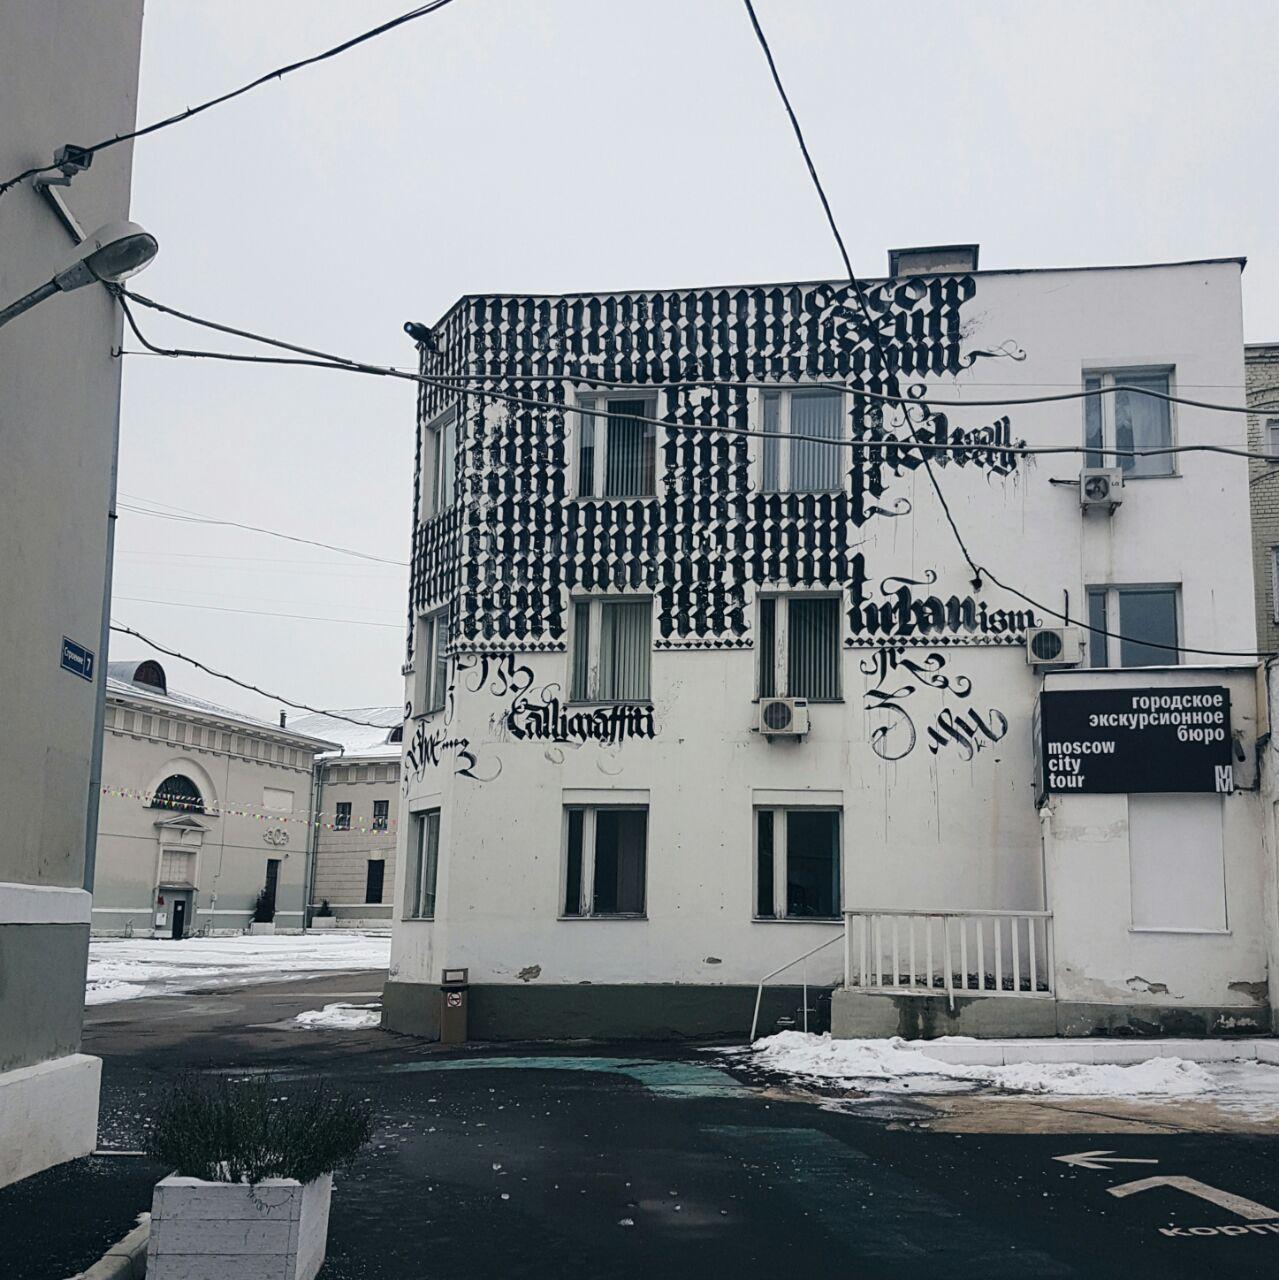 Moscow, Russia street art. Москва, Россия - стрит арт